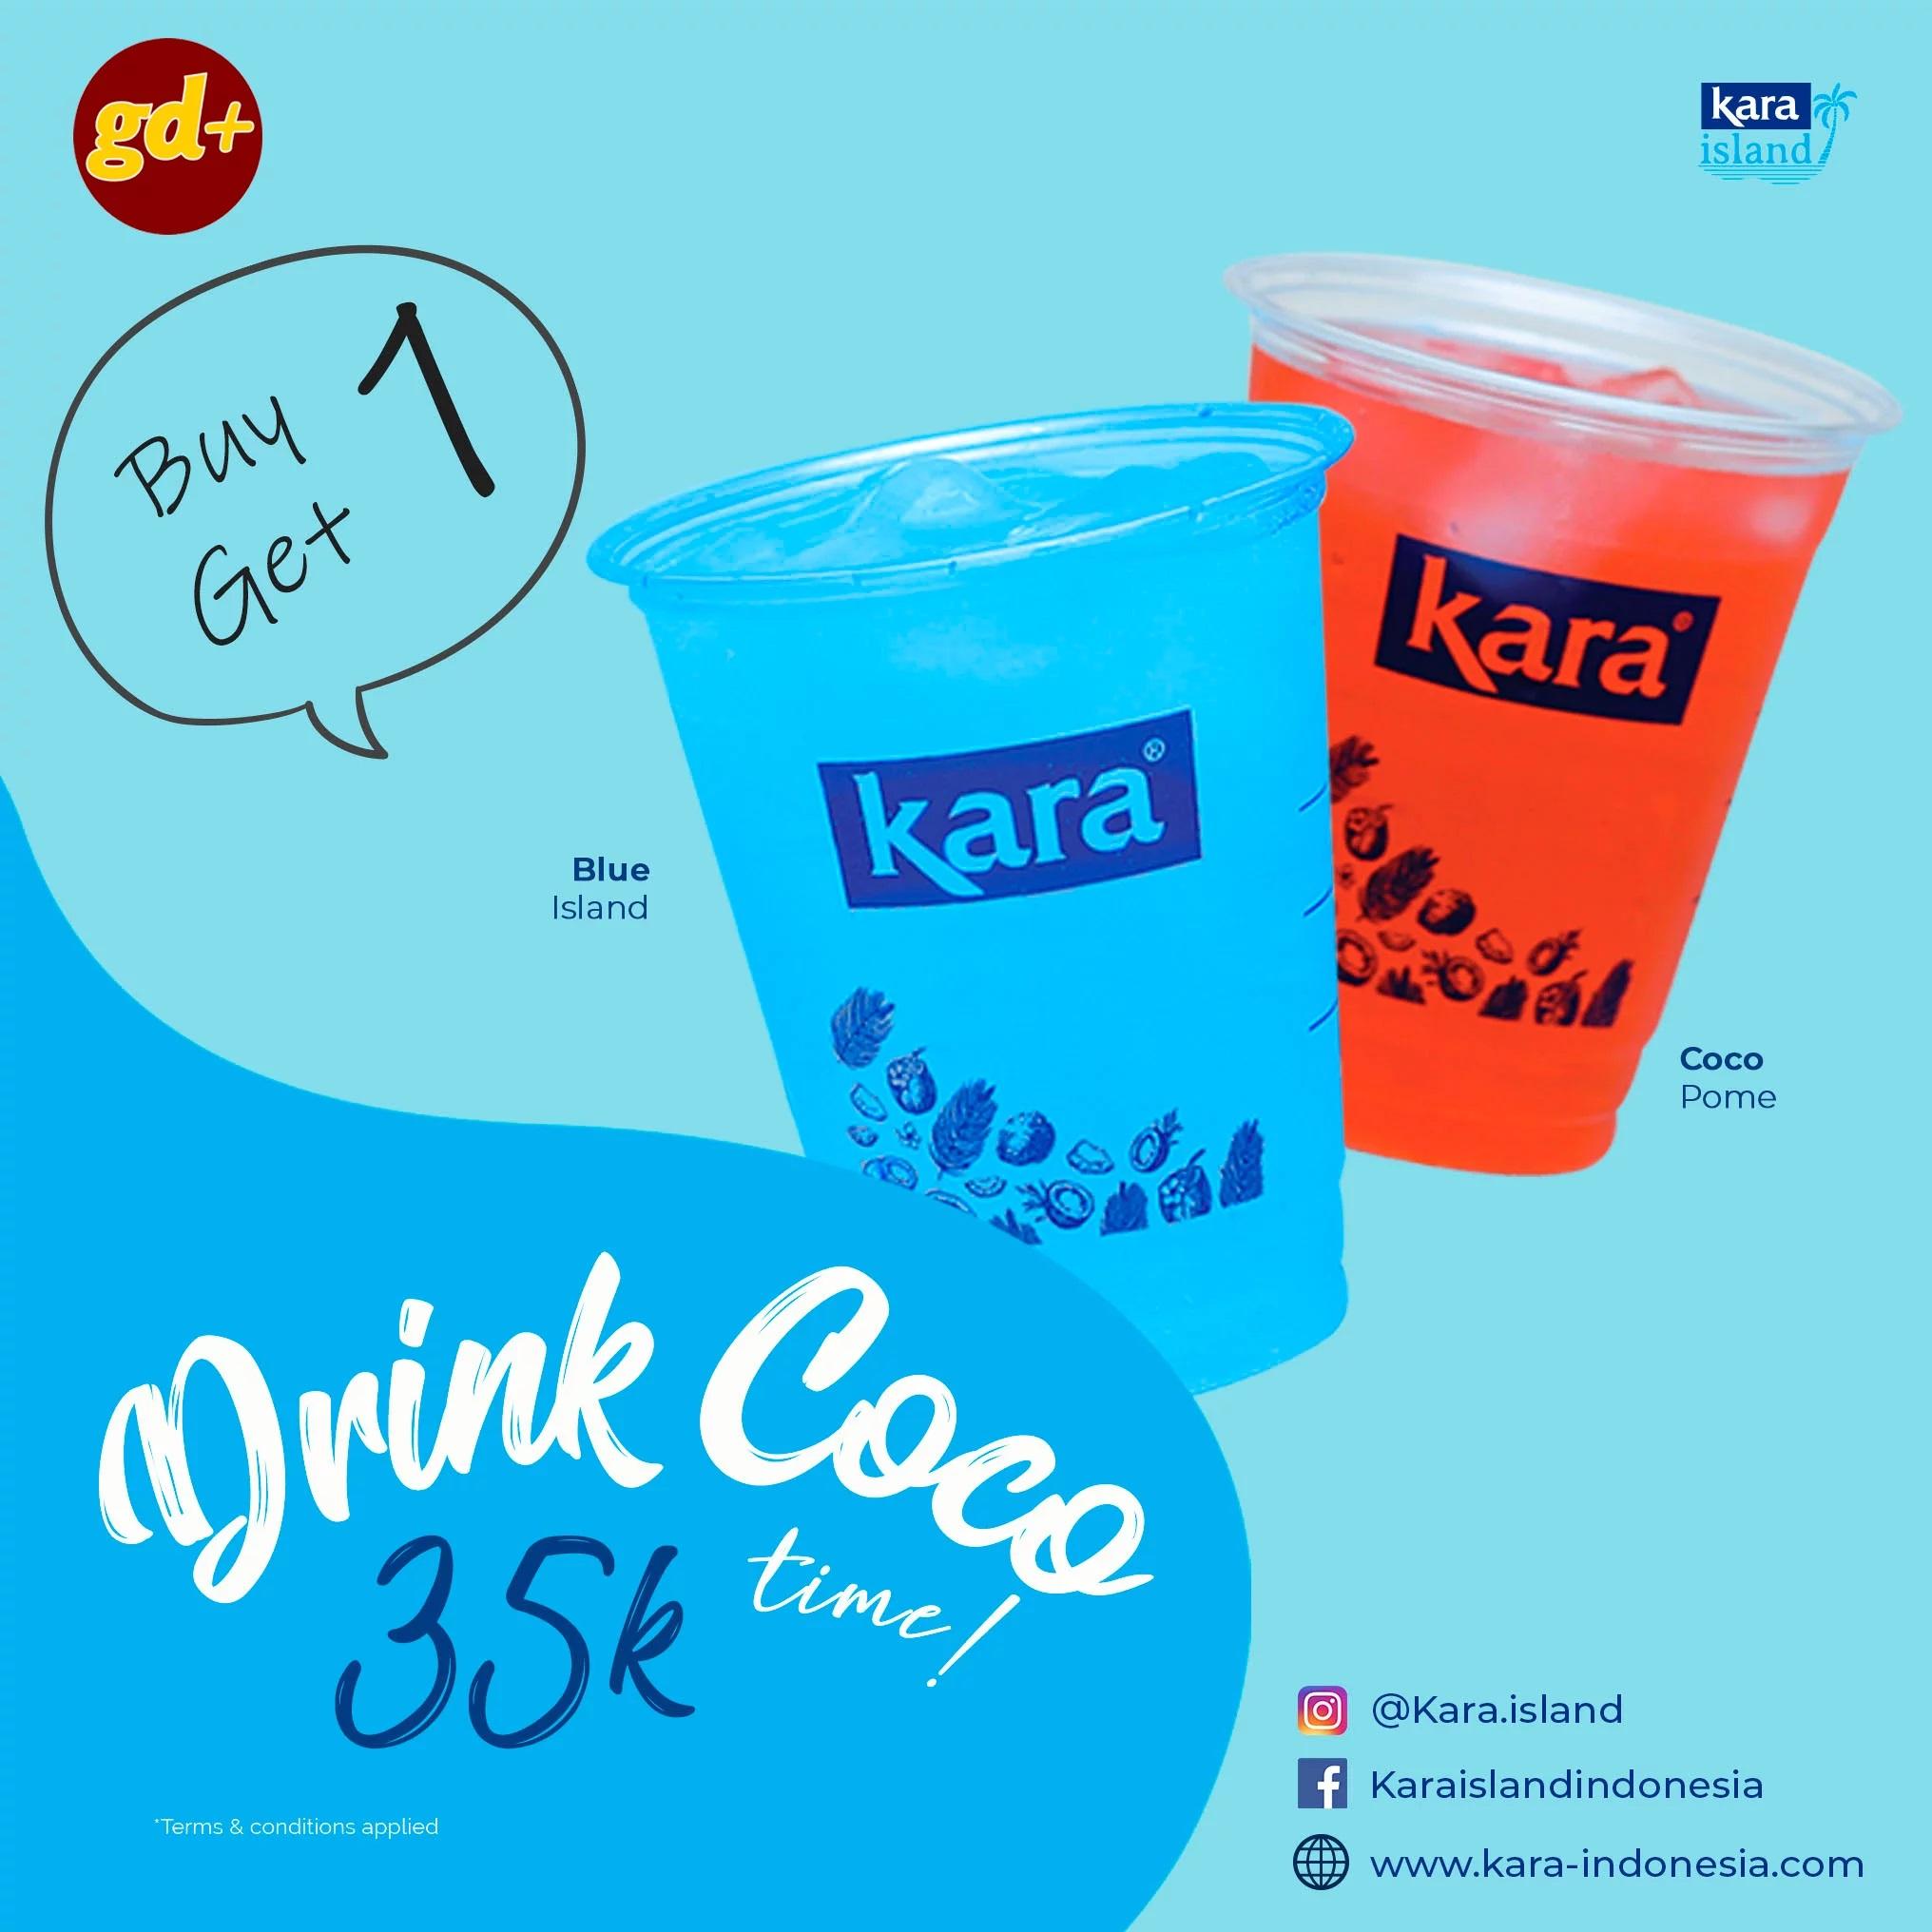 Promo Kara Island Spesial GD+, BUY 1 GET 1 FREE Minuman Segar Drink Coco